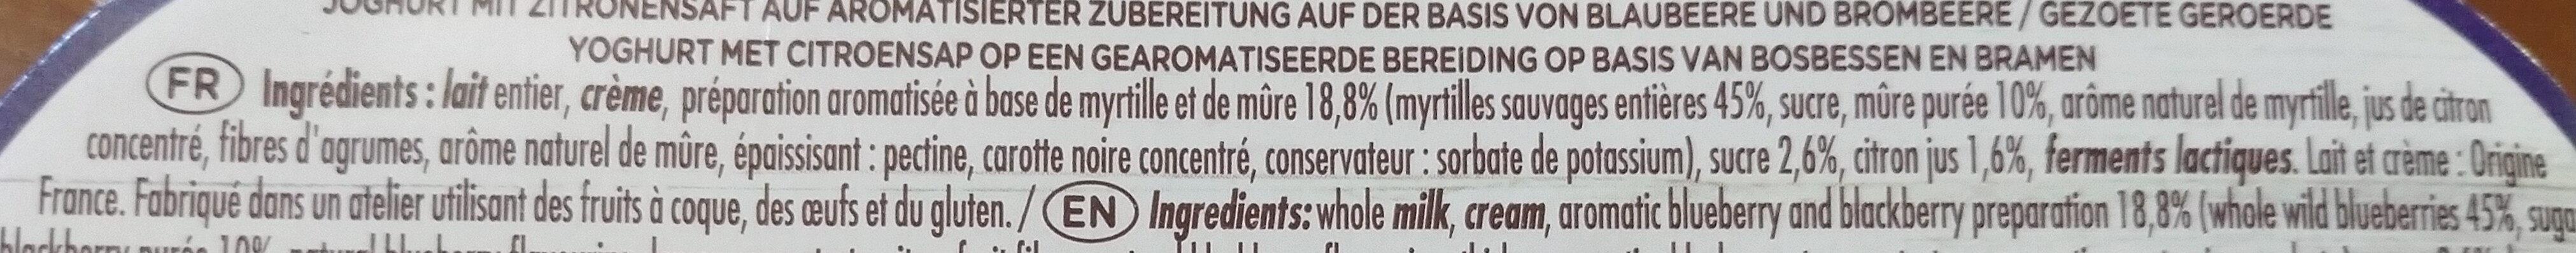 Yaourt bicouche mûre myrtille - Ingredients - fr